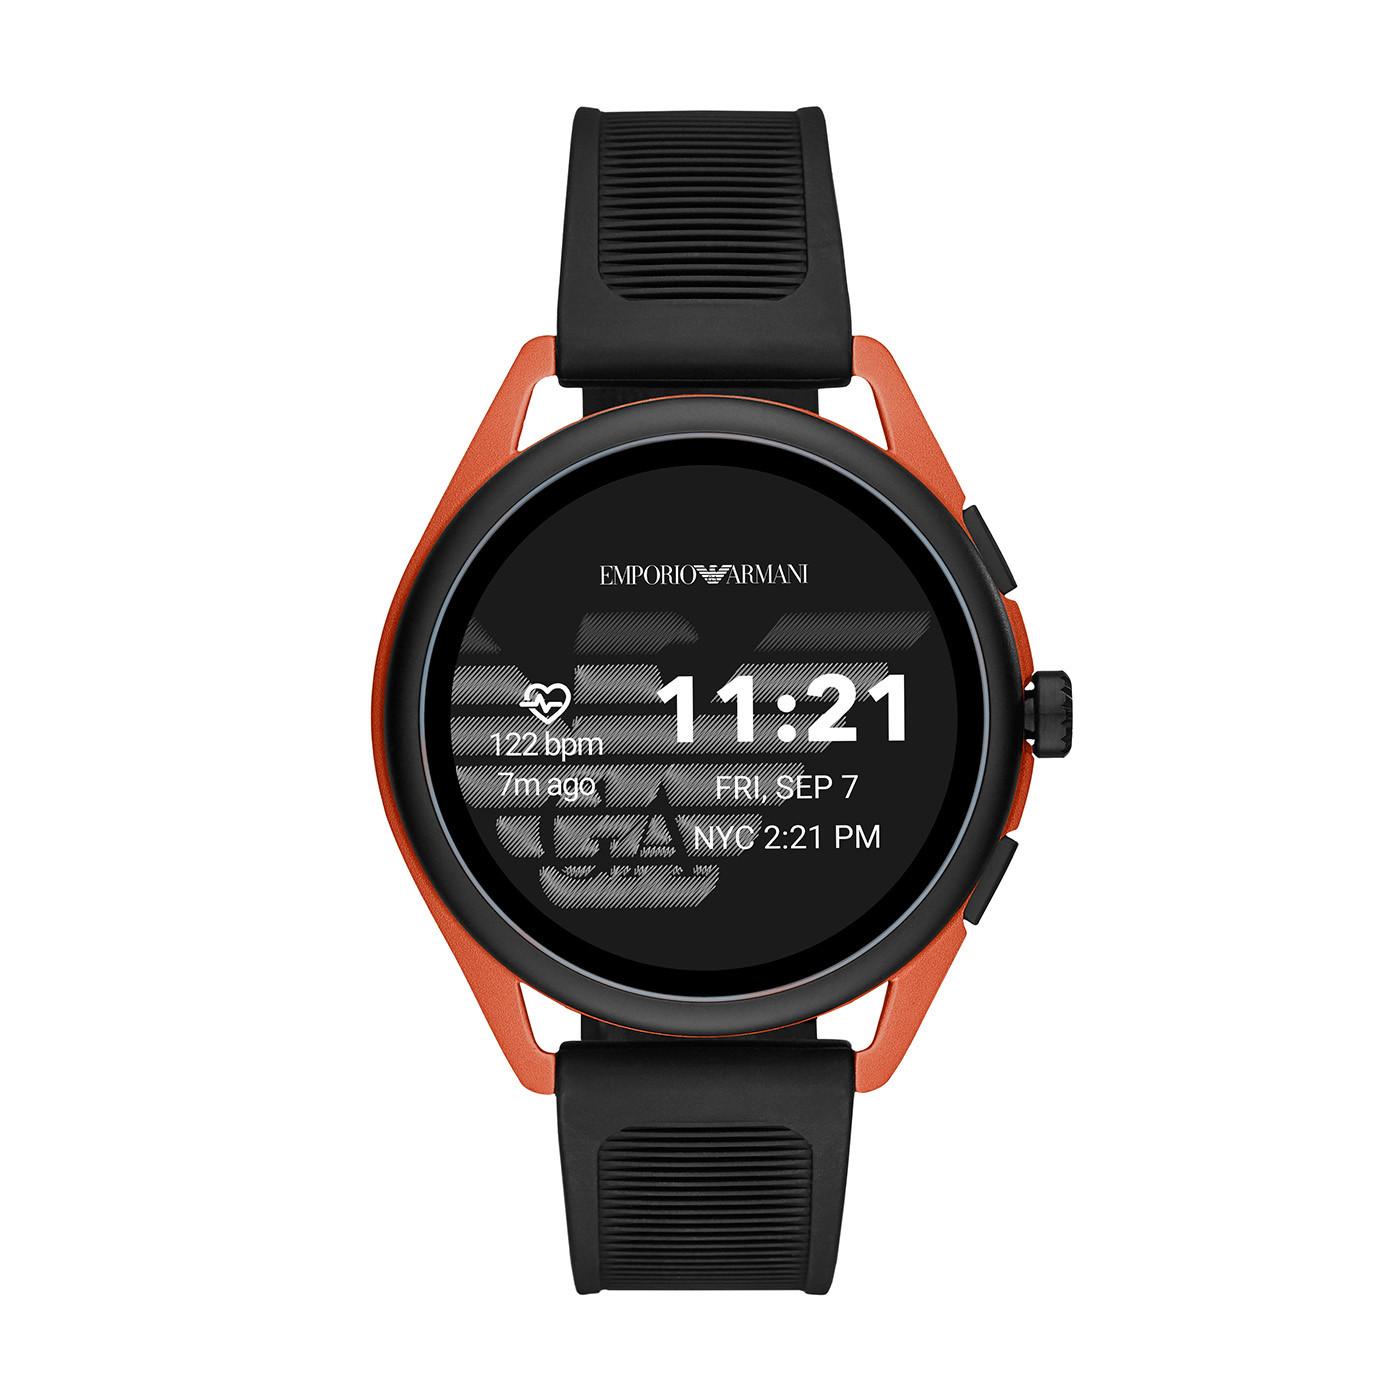 Emporio Armani Connected Matteo Gen 5 Display Smartwatch ART5025